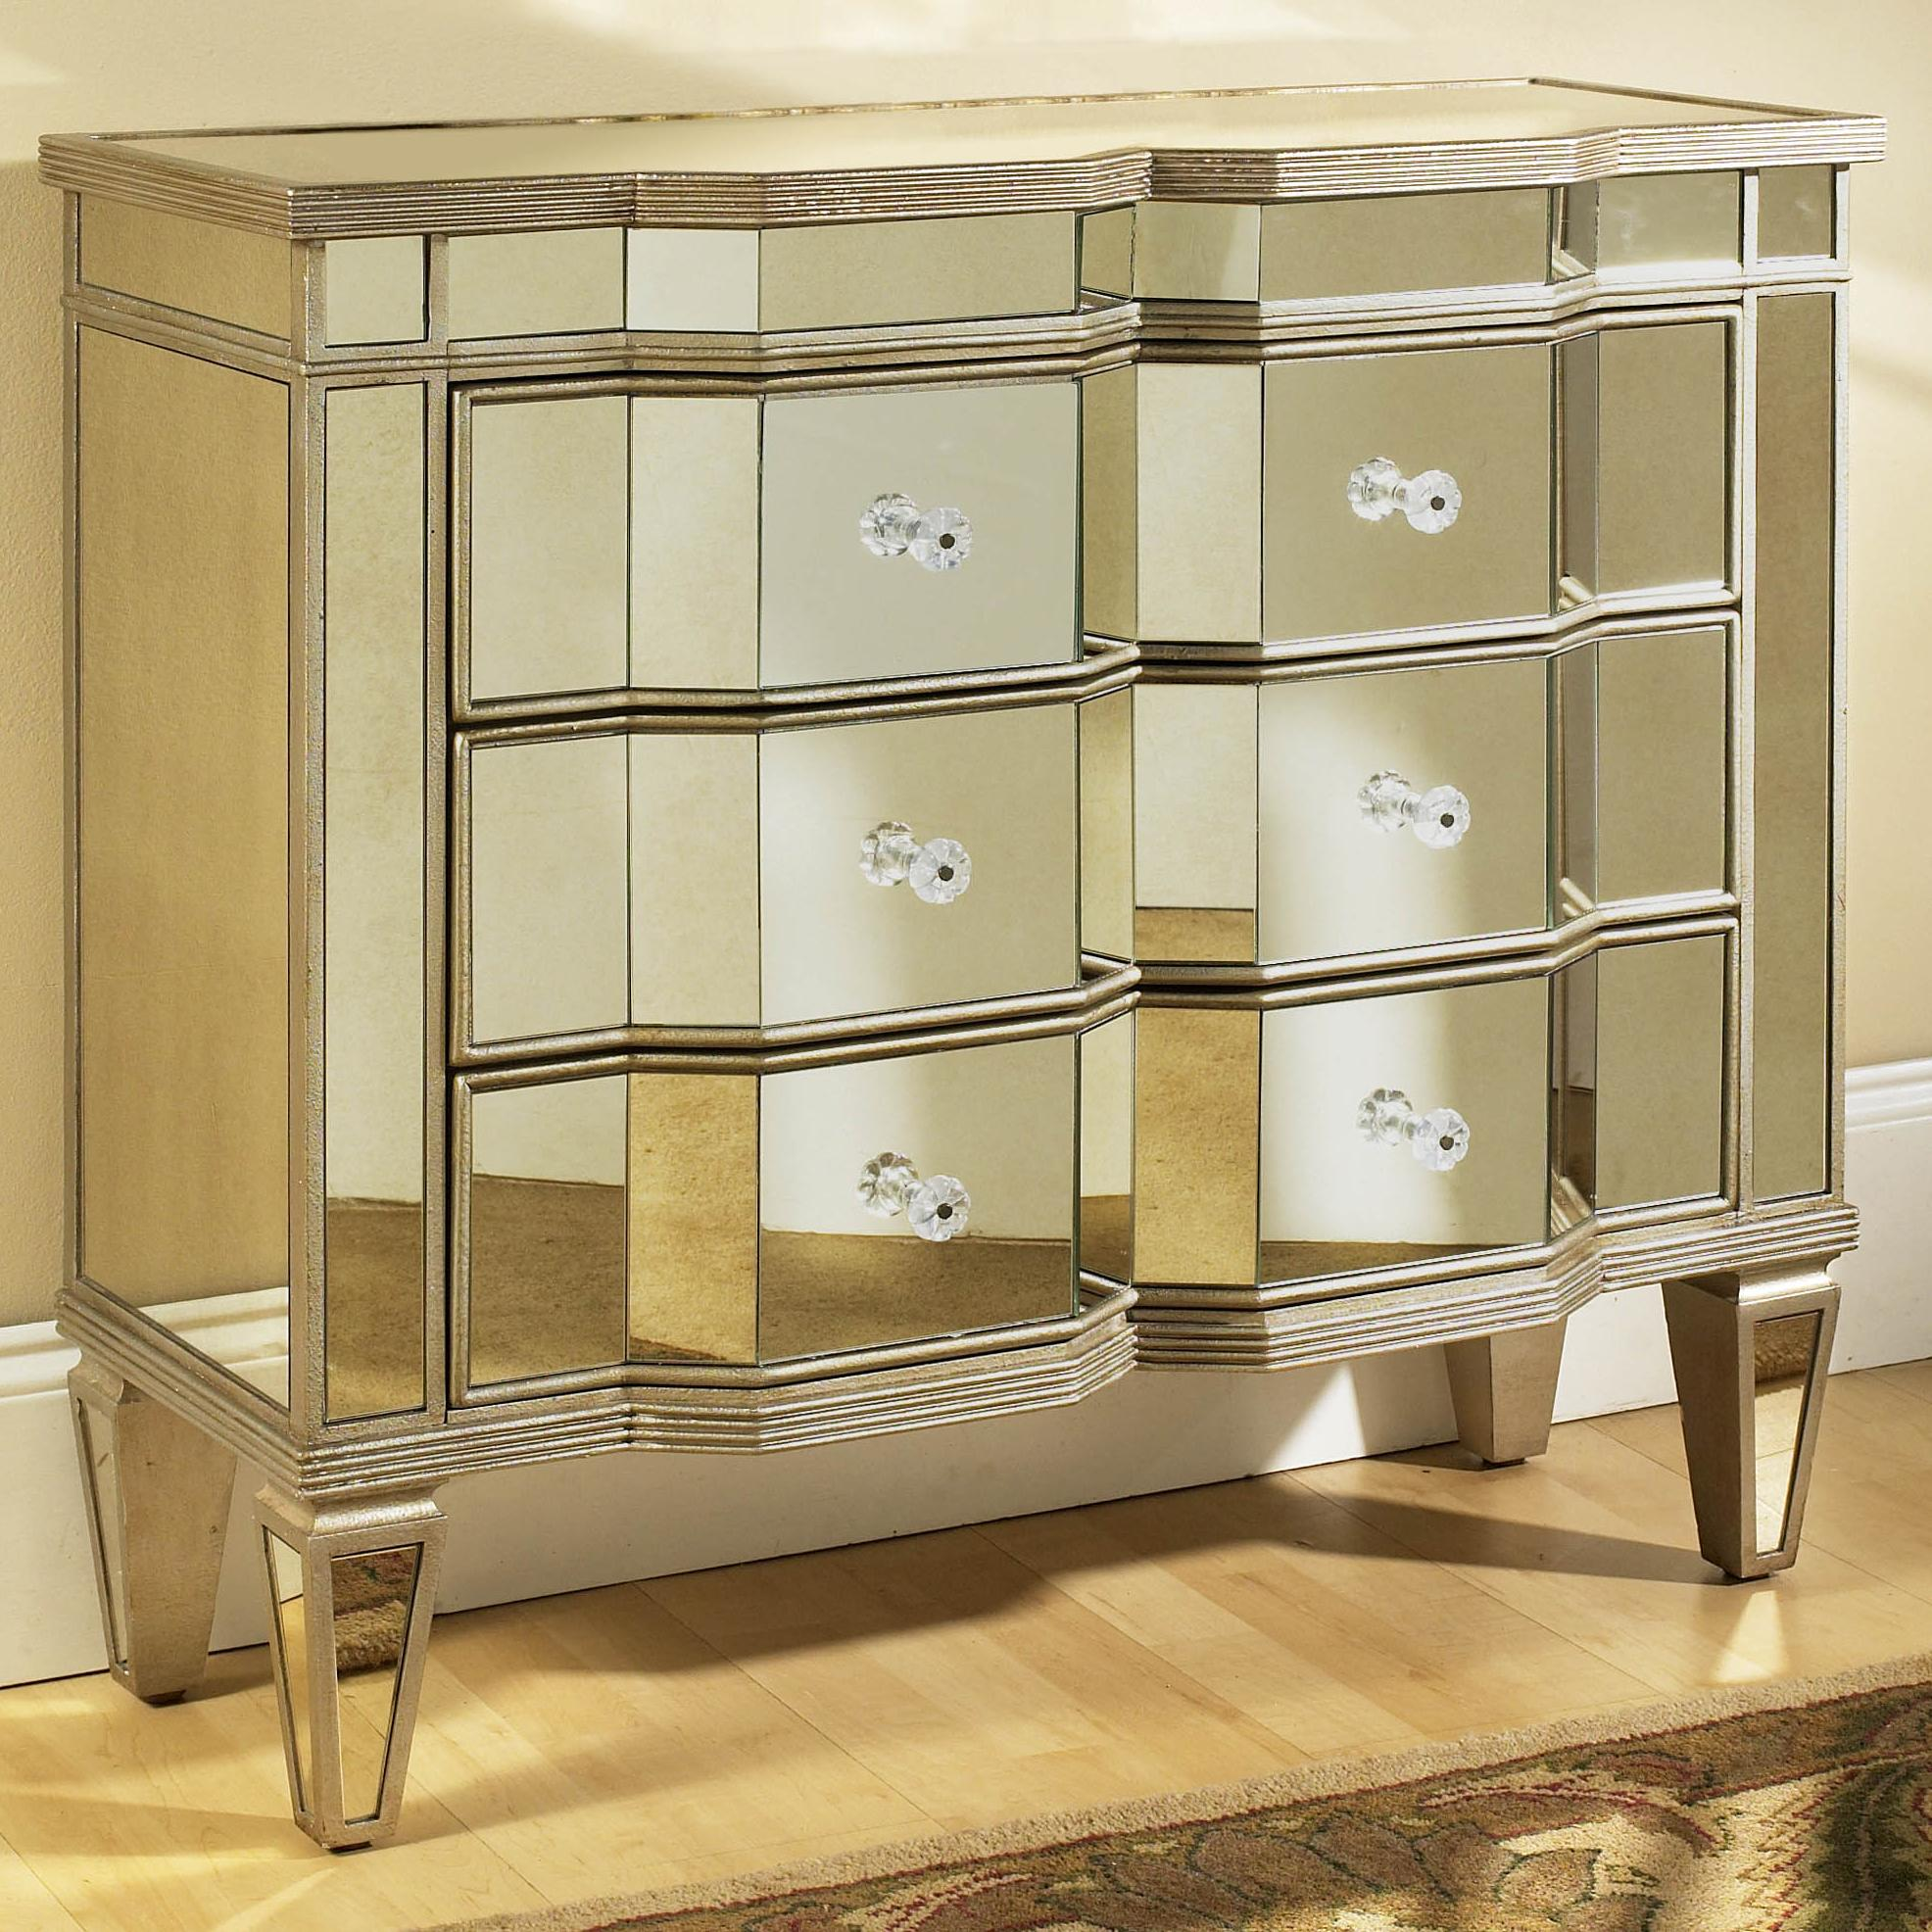 Pulaski Furniture Accents Accent Chest - Item Number: 917062